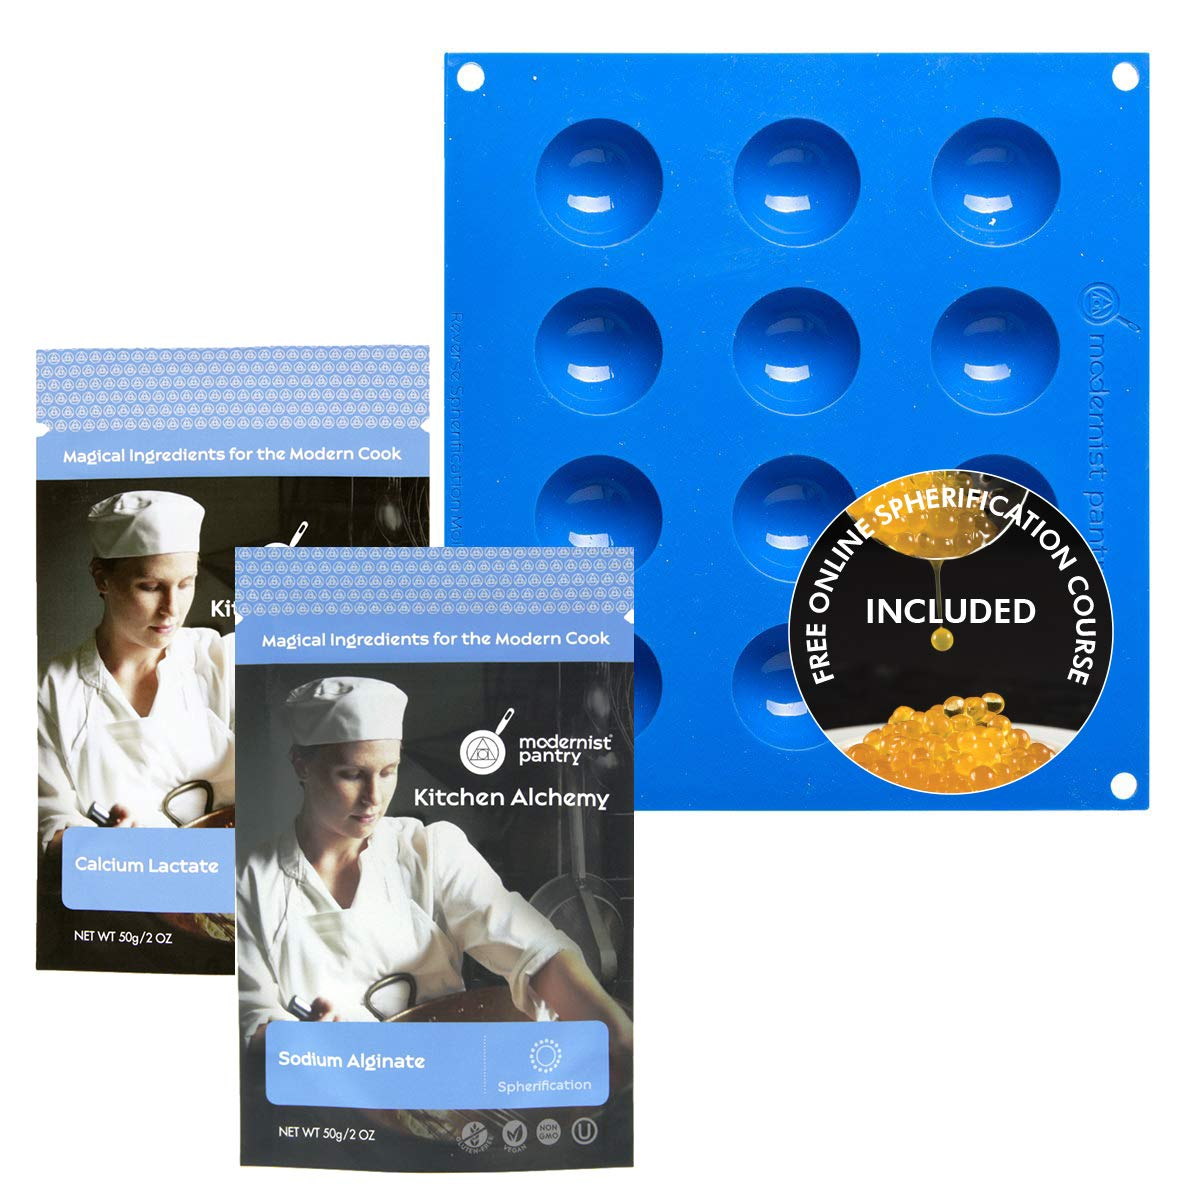 Reverse Spherification Kit [Molecular Gastronomy] ⊘ Non-GMO ❤ Gluten-Free ☮ Vegan ✡ OU Kosher Certified Ingredients